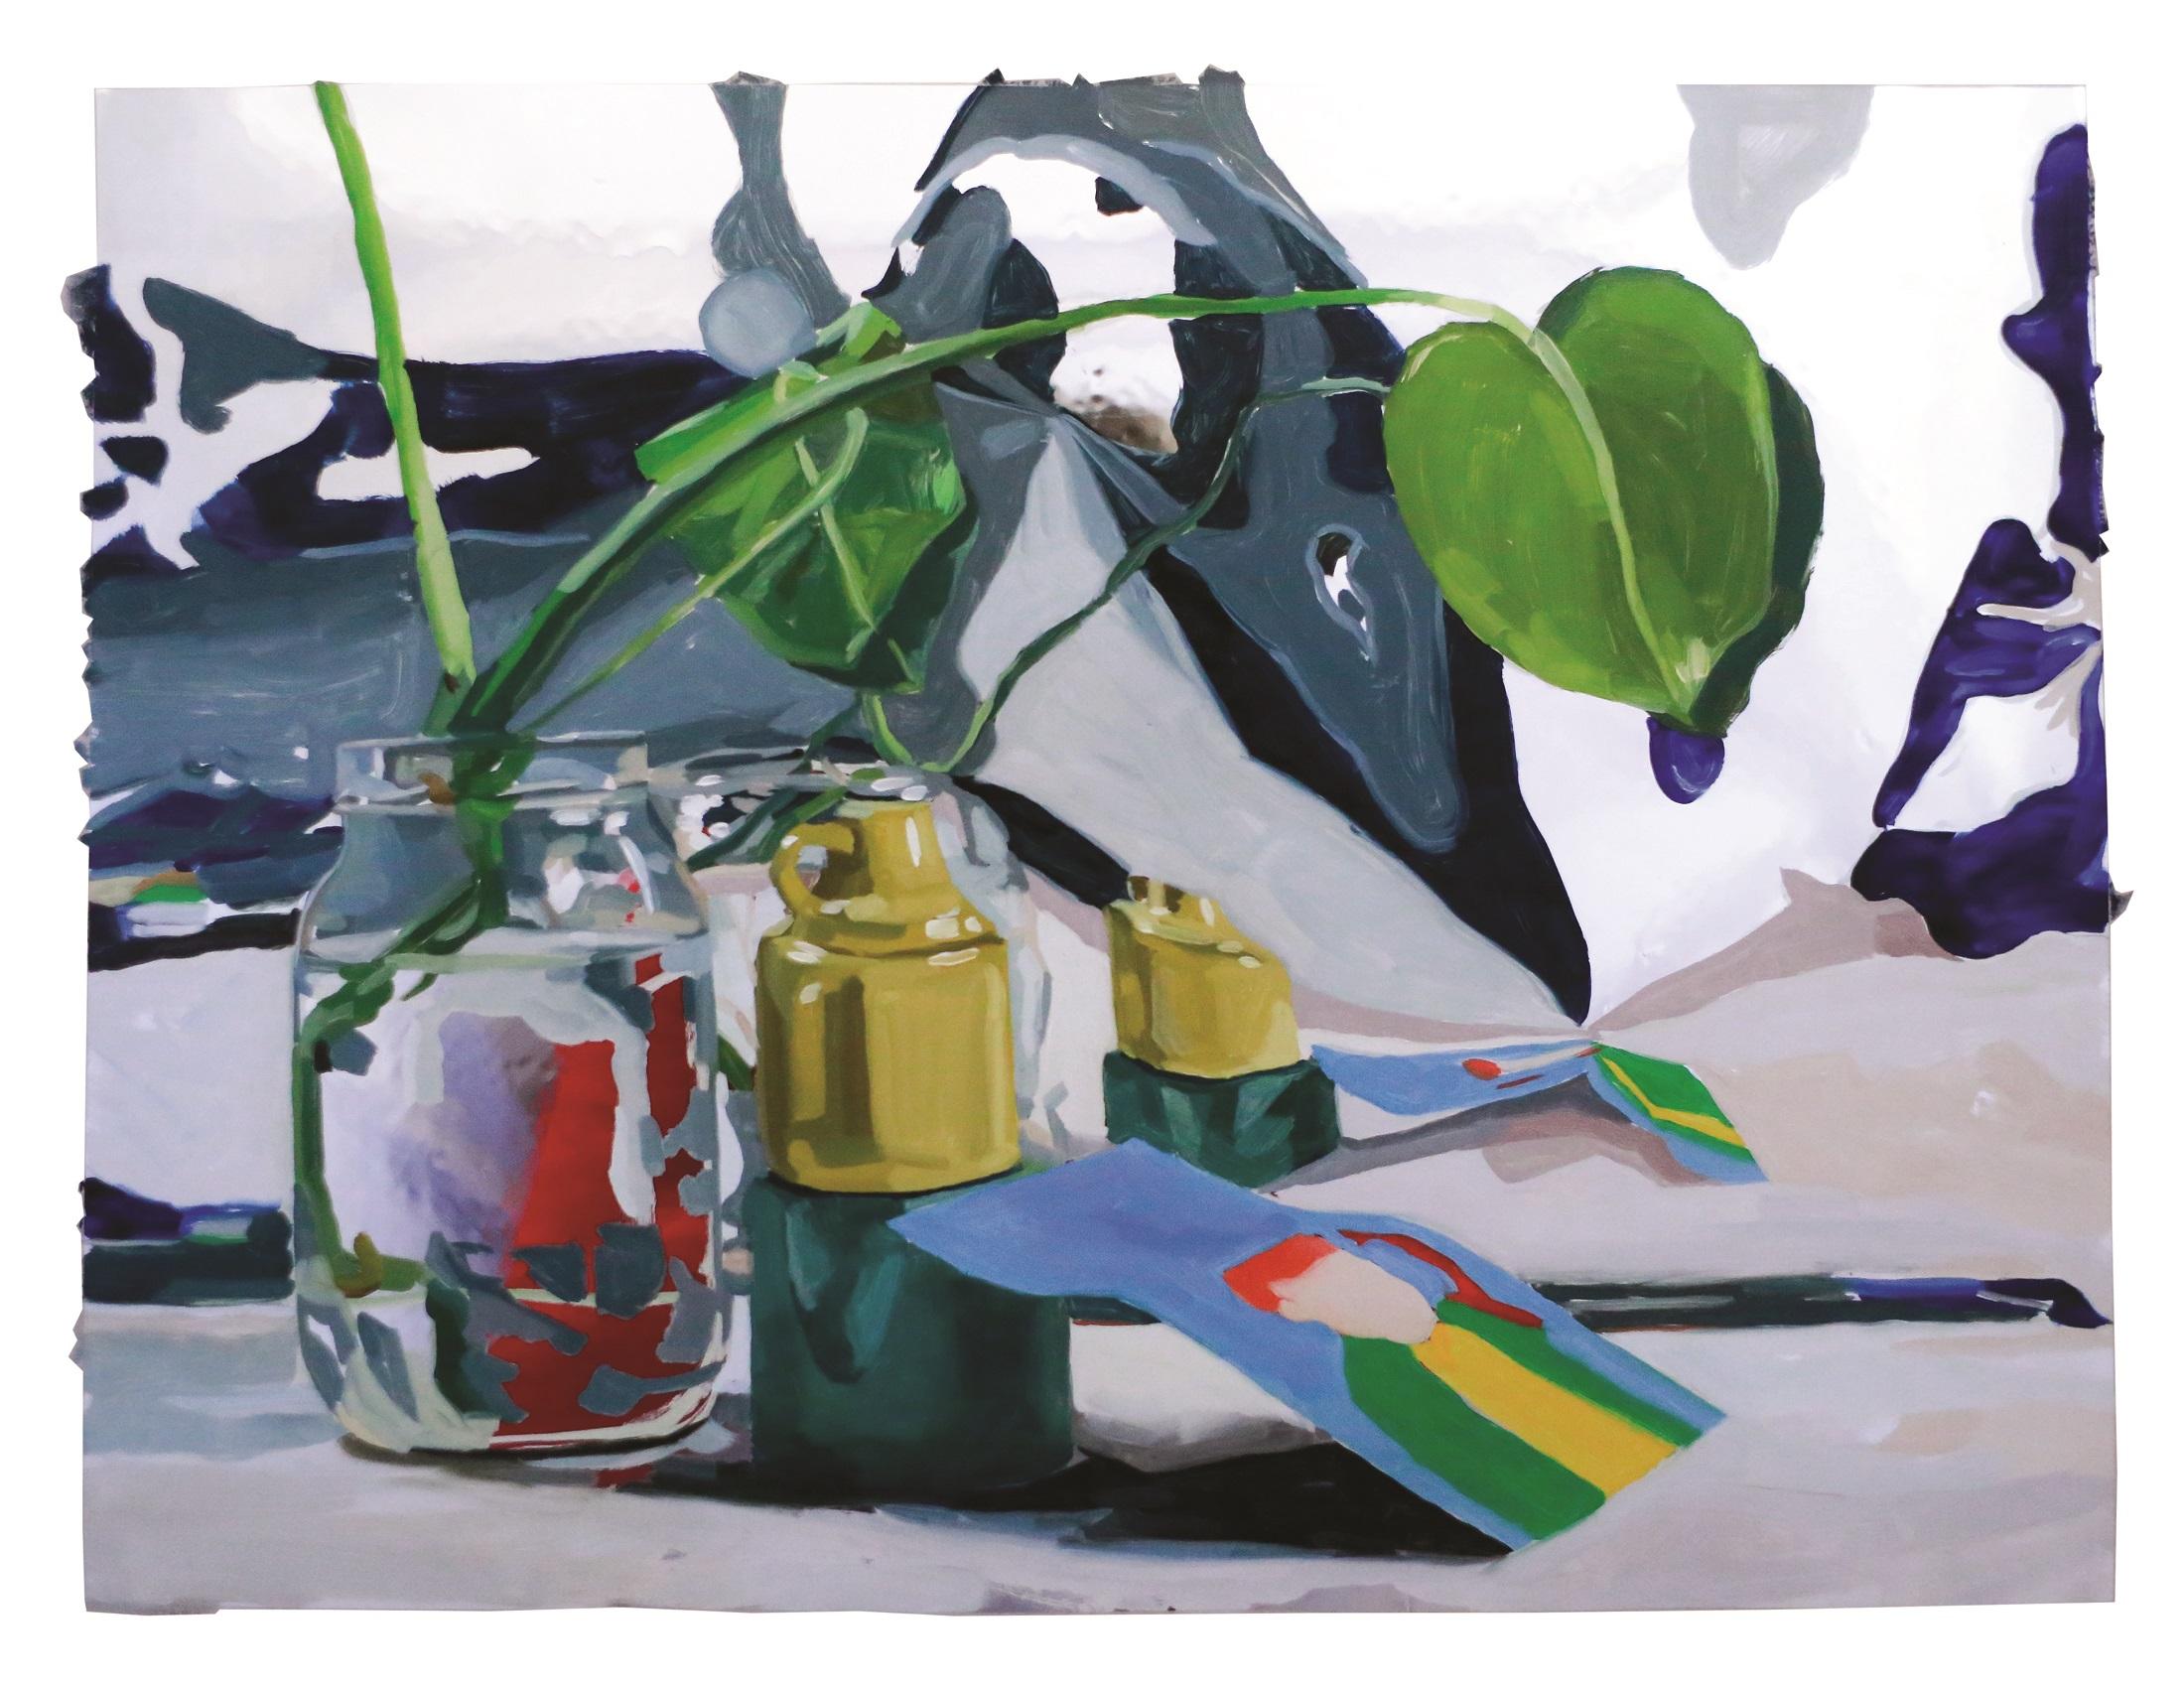 Study of Objects Ft. Joan Cornella #2